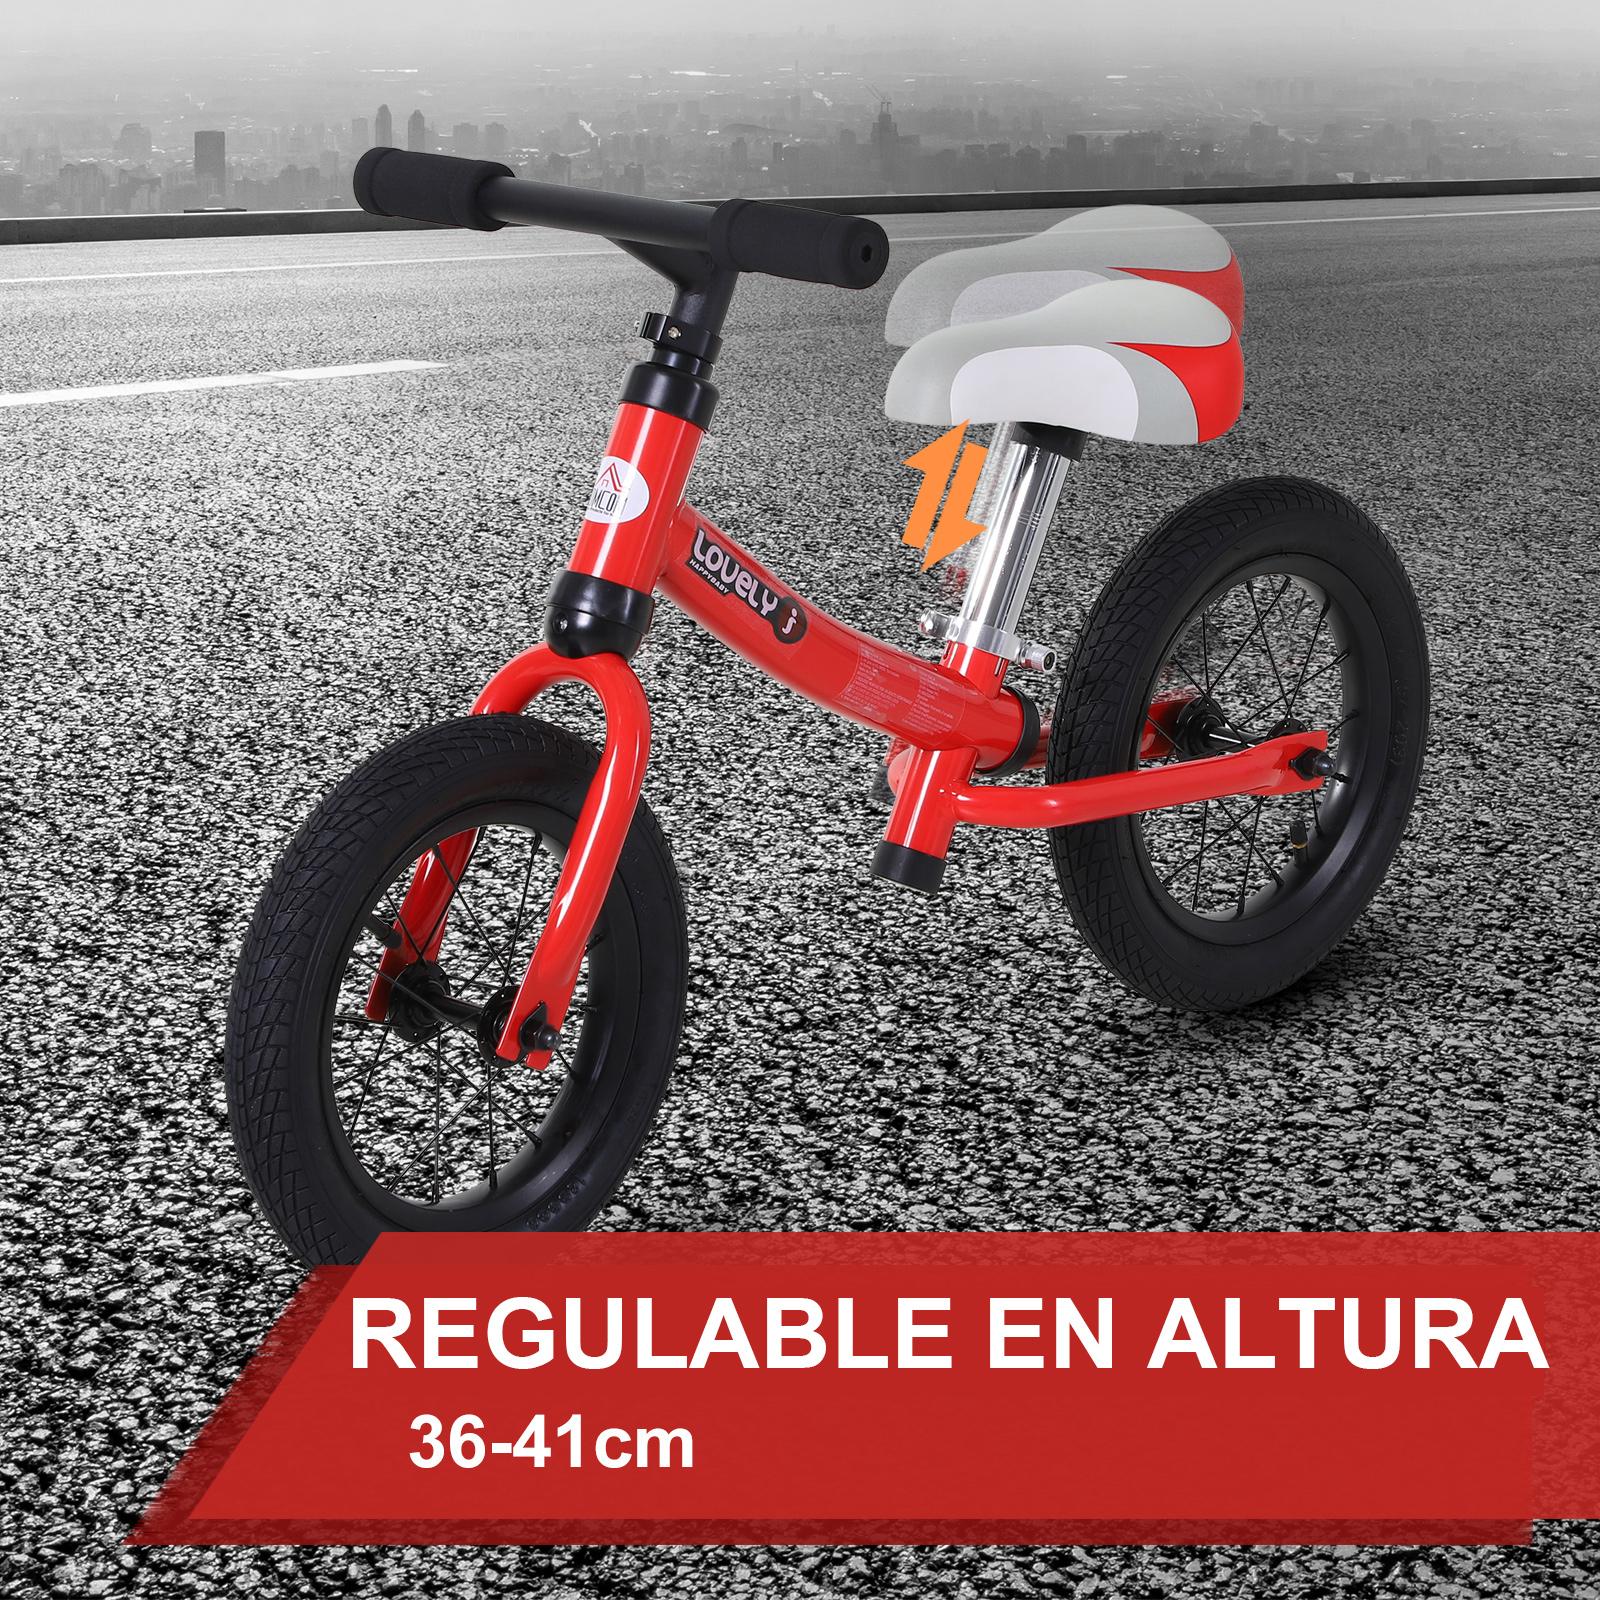 Bicicleta-sin-Pedales-de-Altura-de-Asiento-Regulable-31-45cm-2-5-Anos miniatura 16